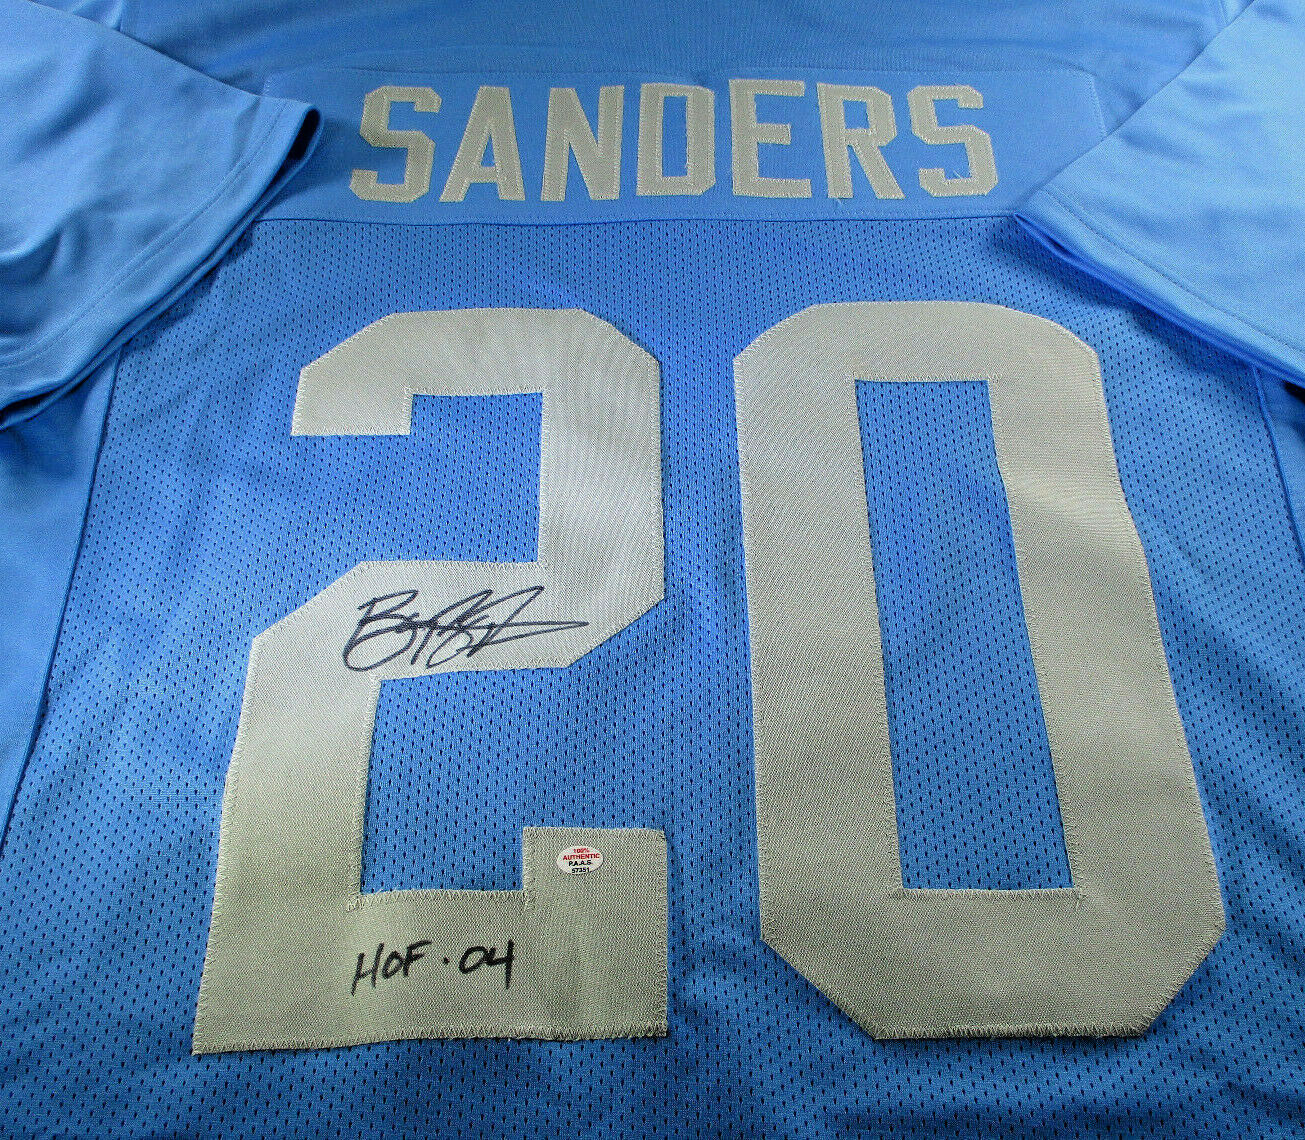 BARRY SANDERS / NFL HALL OF FAME / AUTOGRAPHED DETROIT LIONS CUSTOM JERSEY / COA